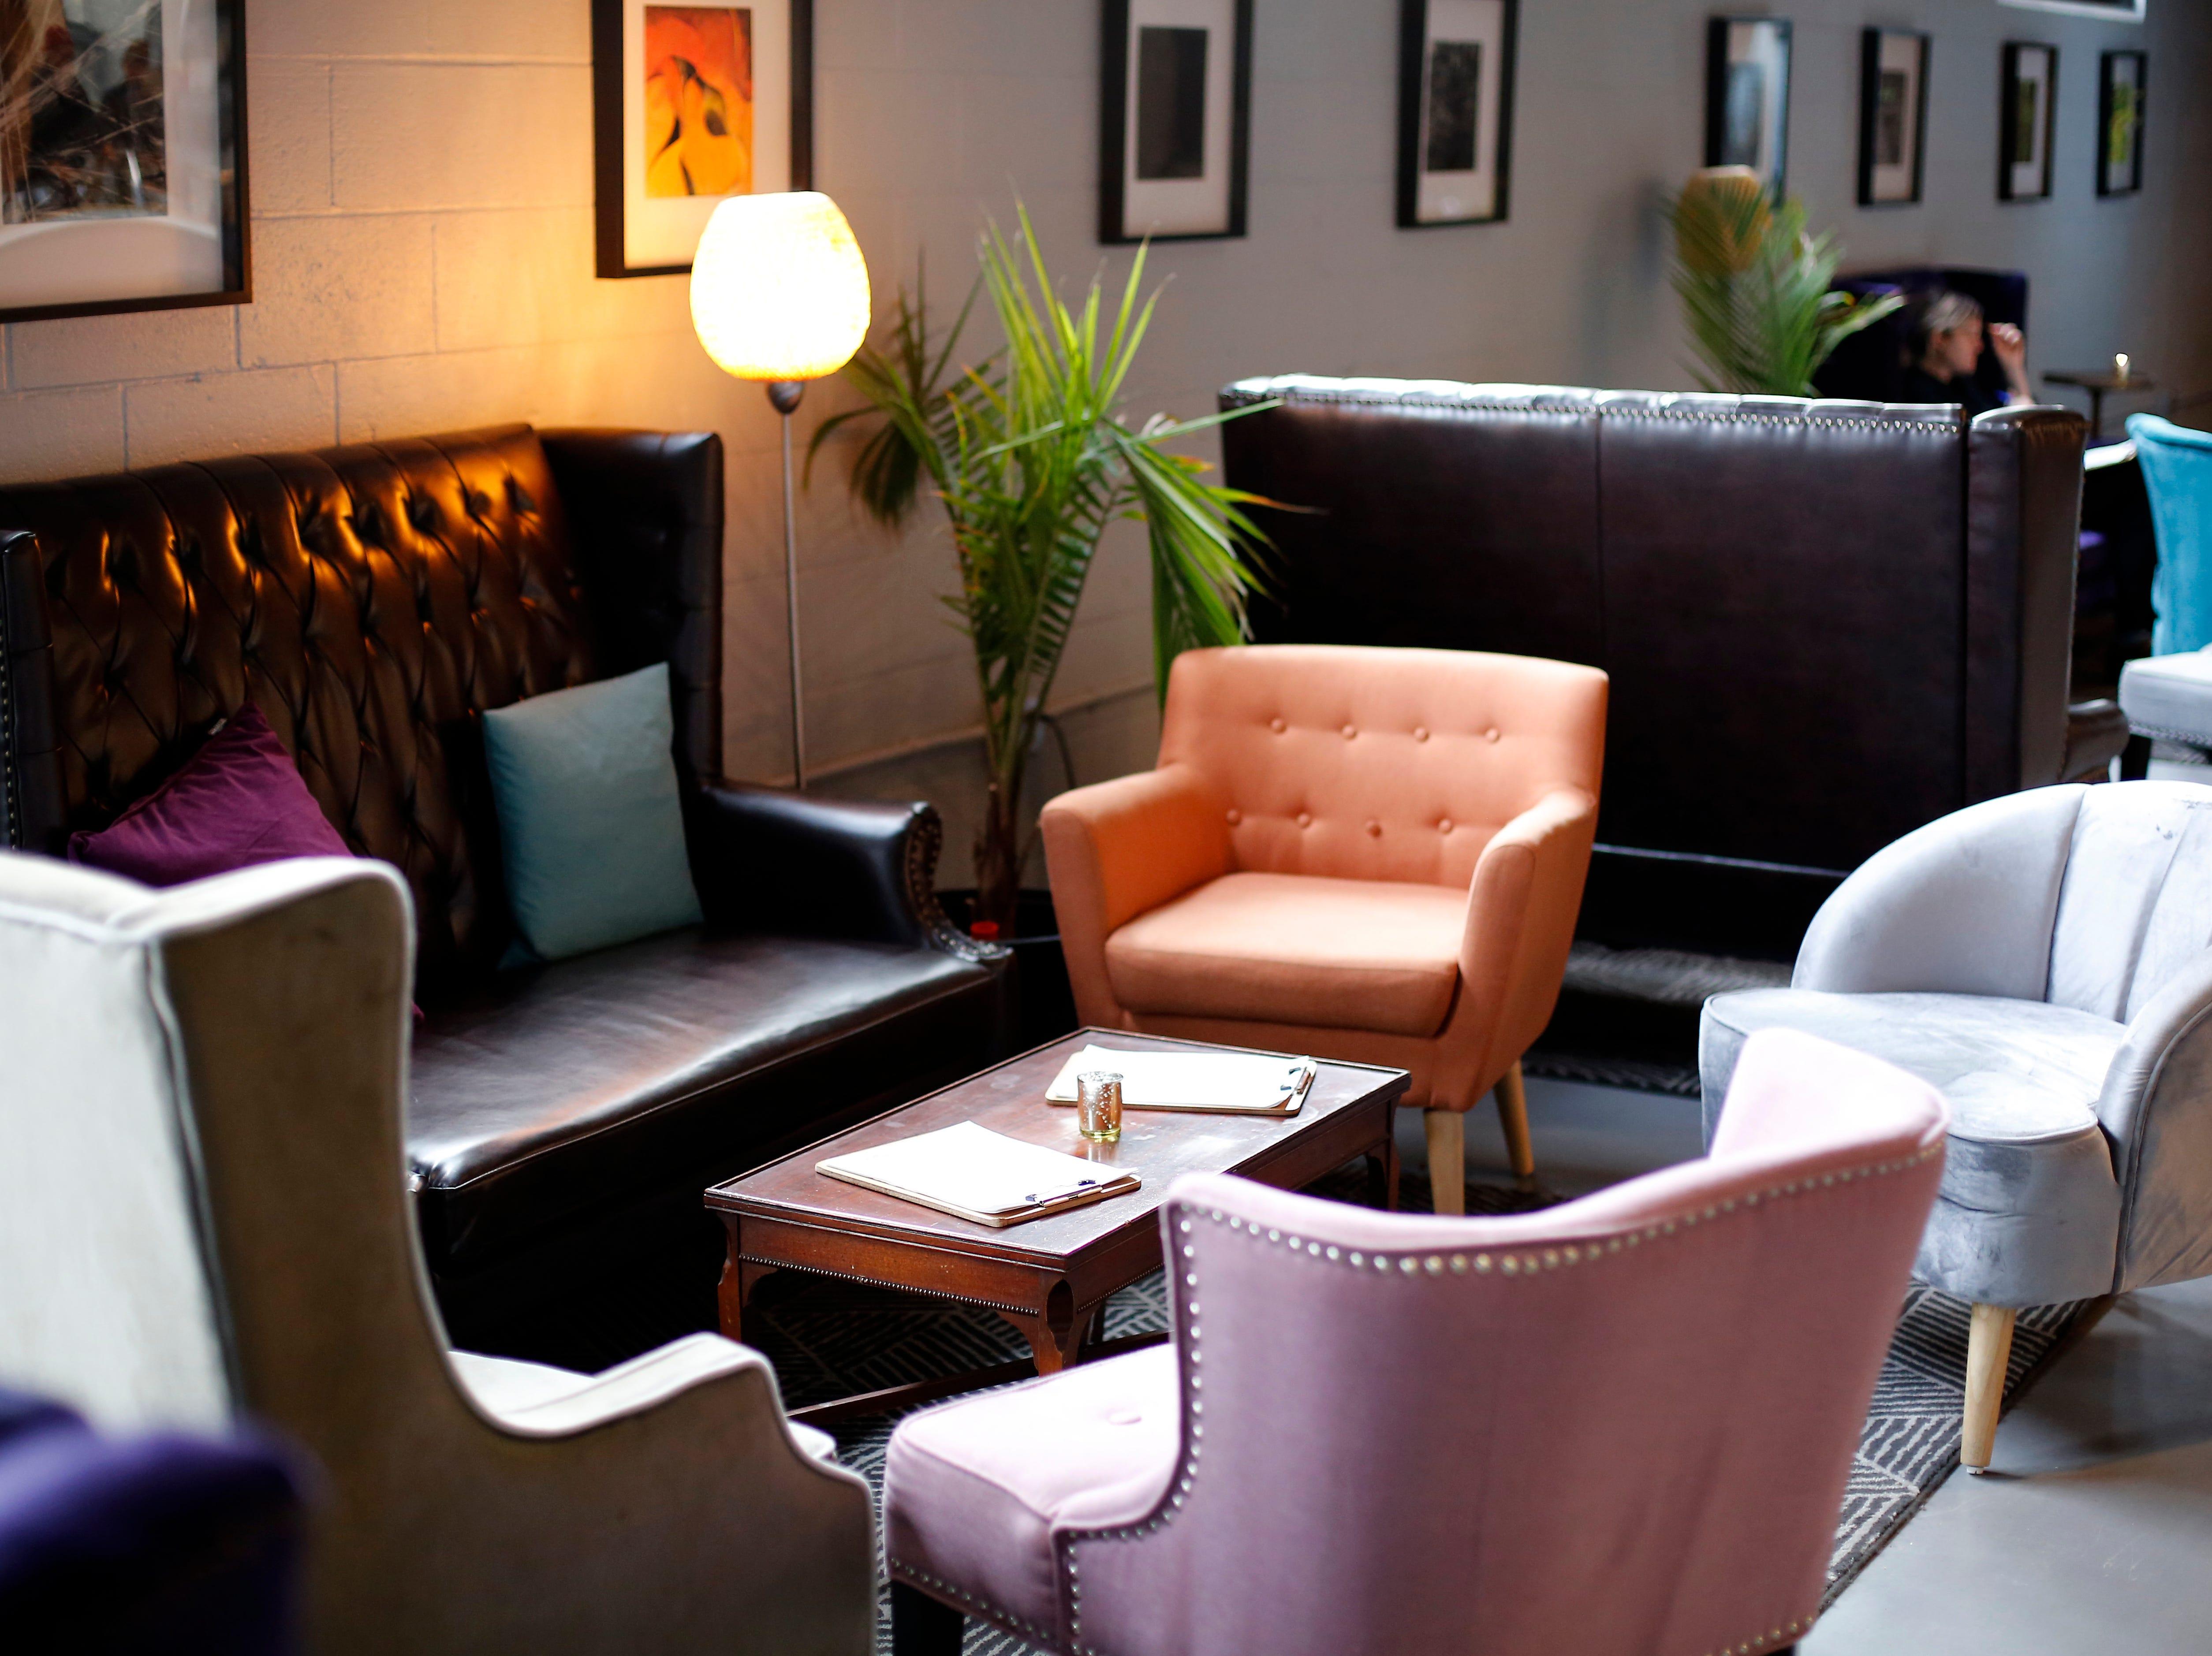 One of the many lounge areas at Karrikin Spirits Co. in the Fairfax neighborhood of Cincinnati on Thursday, Jan. 31, 2019.